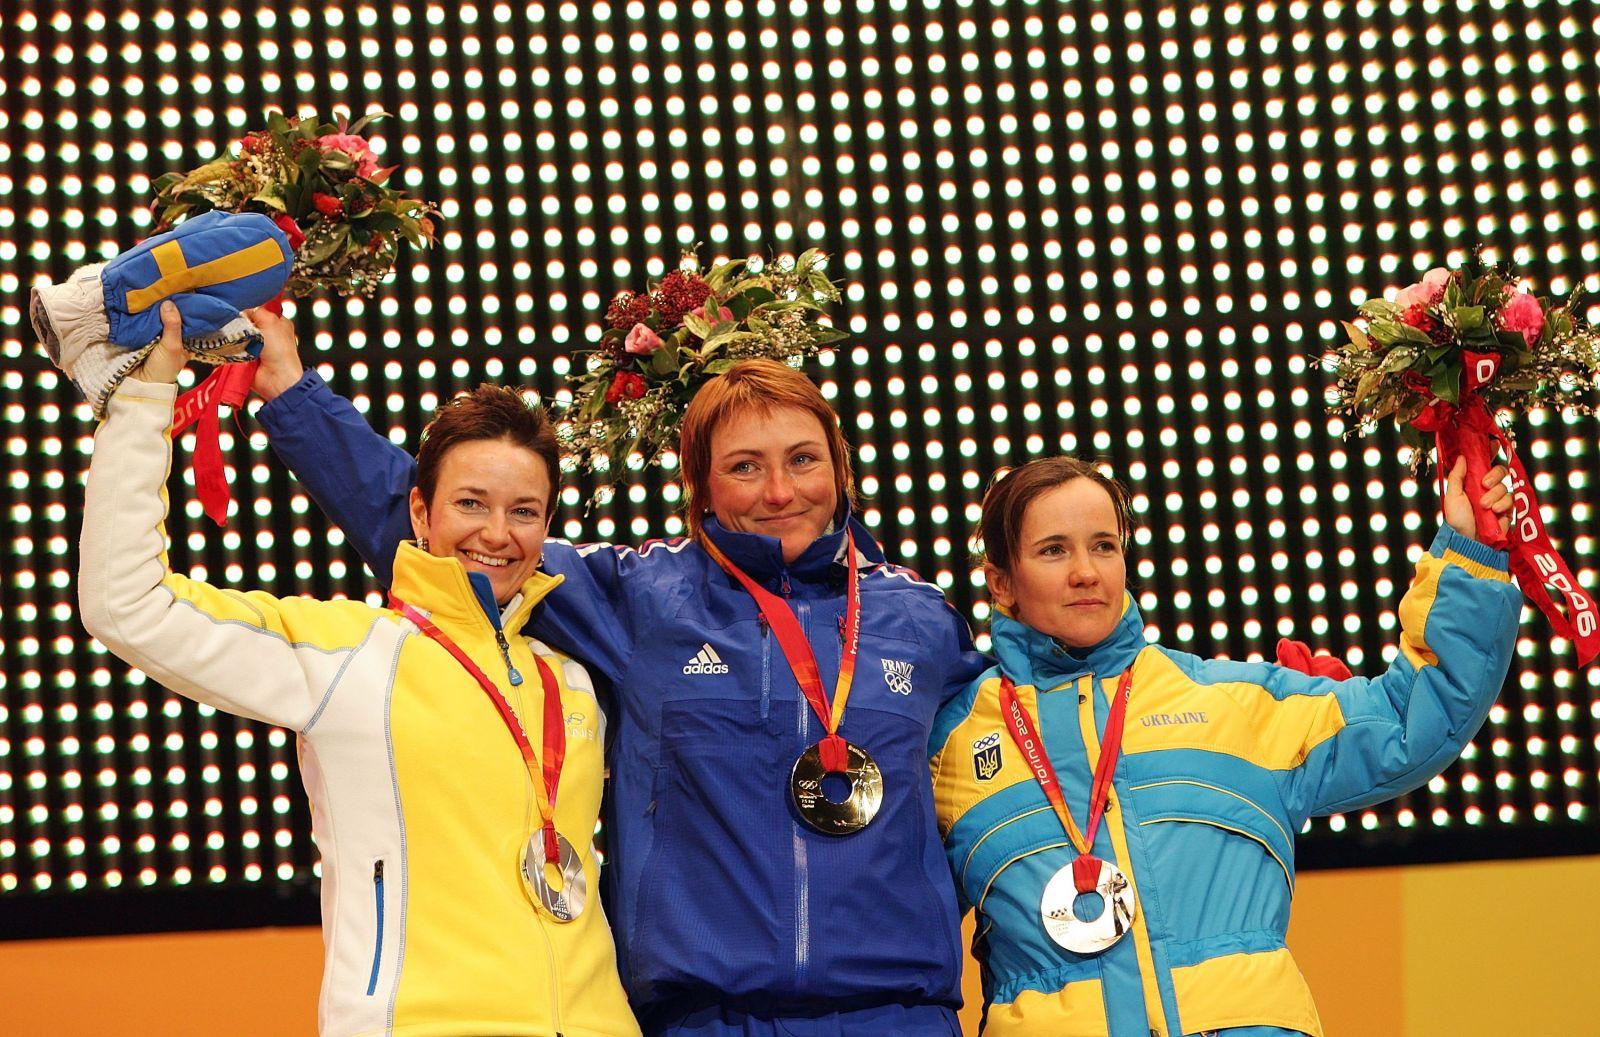 Украинки на зимних Олимпийских играх: пьедестал почета - фото №4